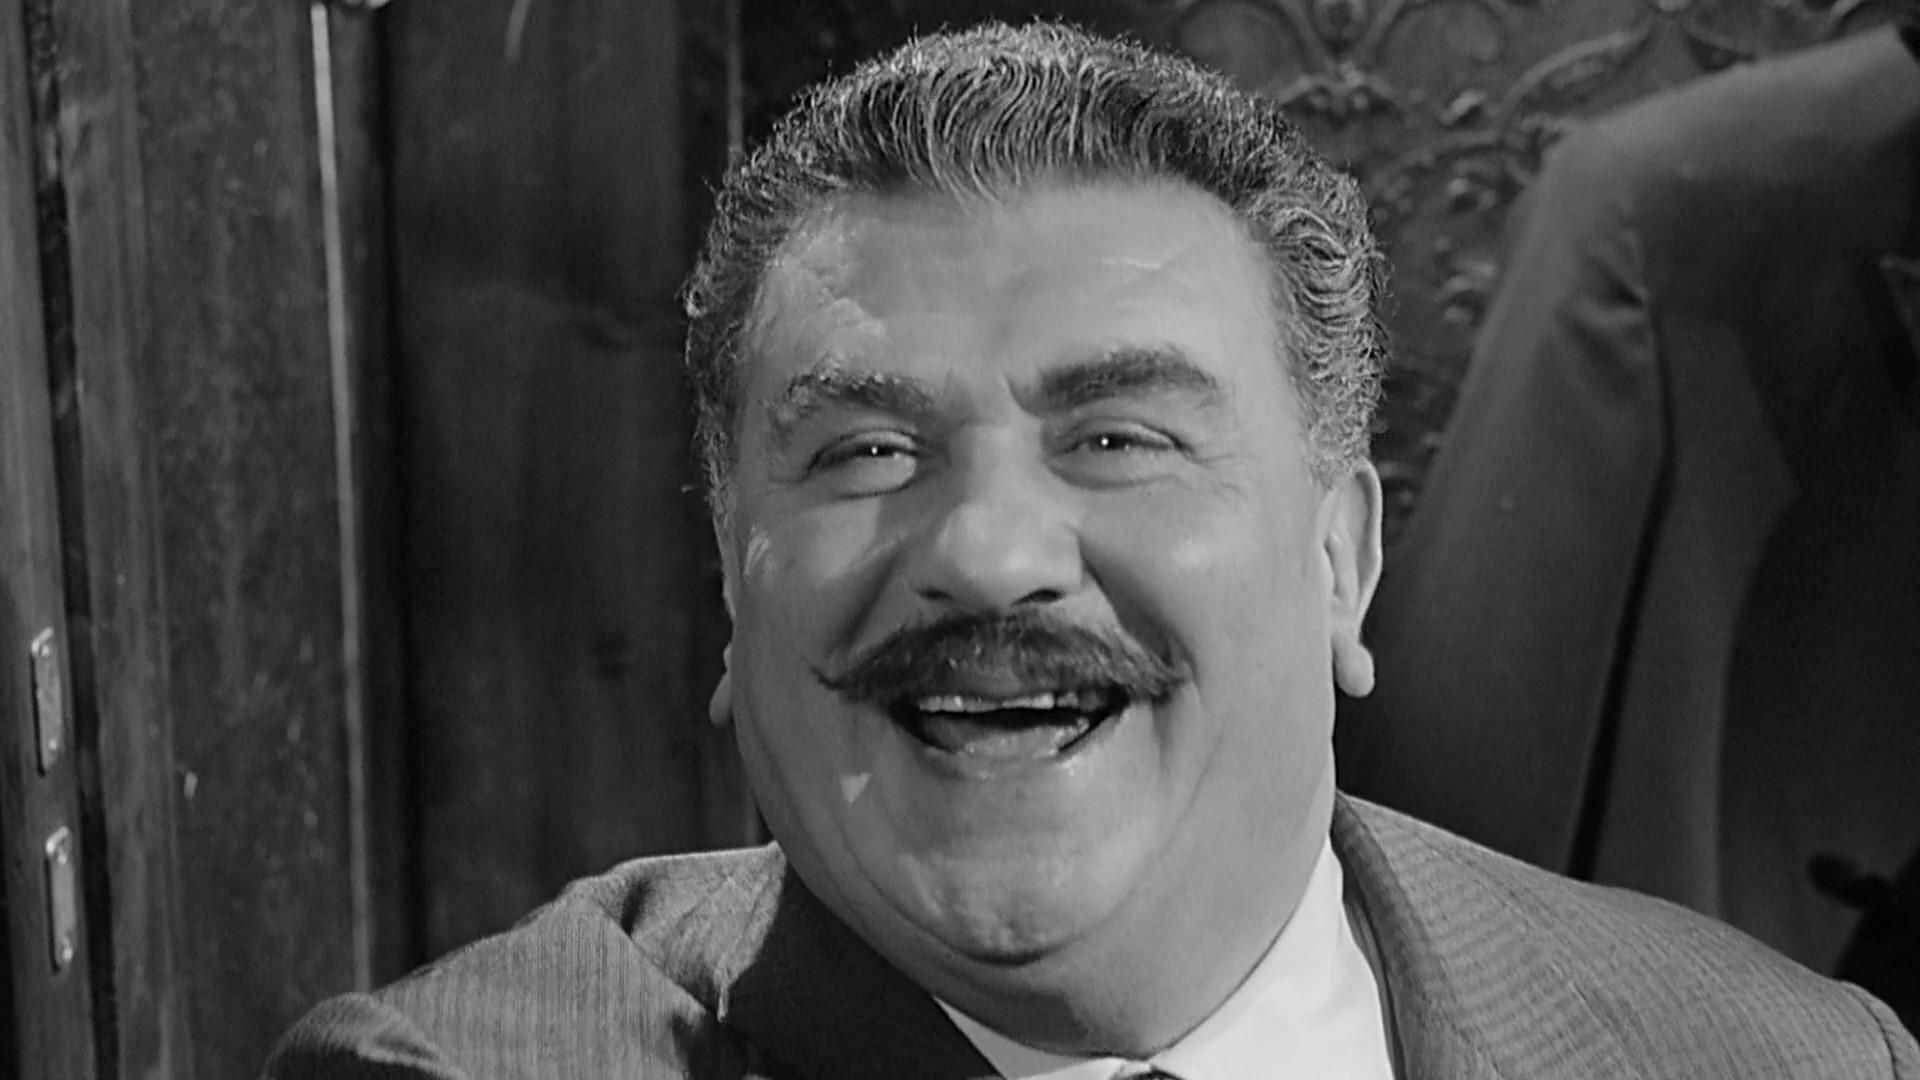 Chi era Gino Cervi